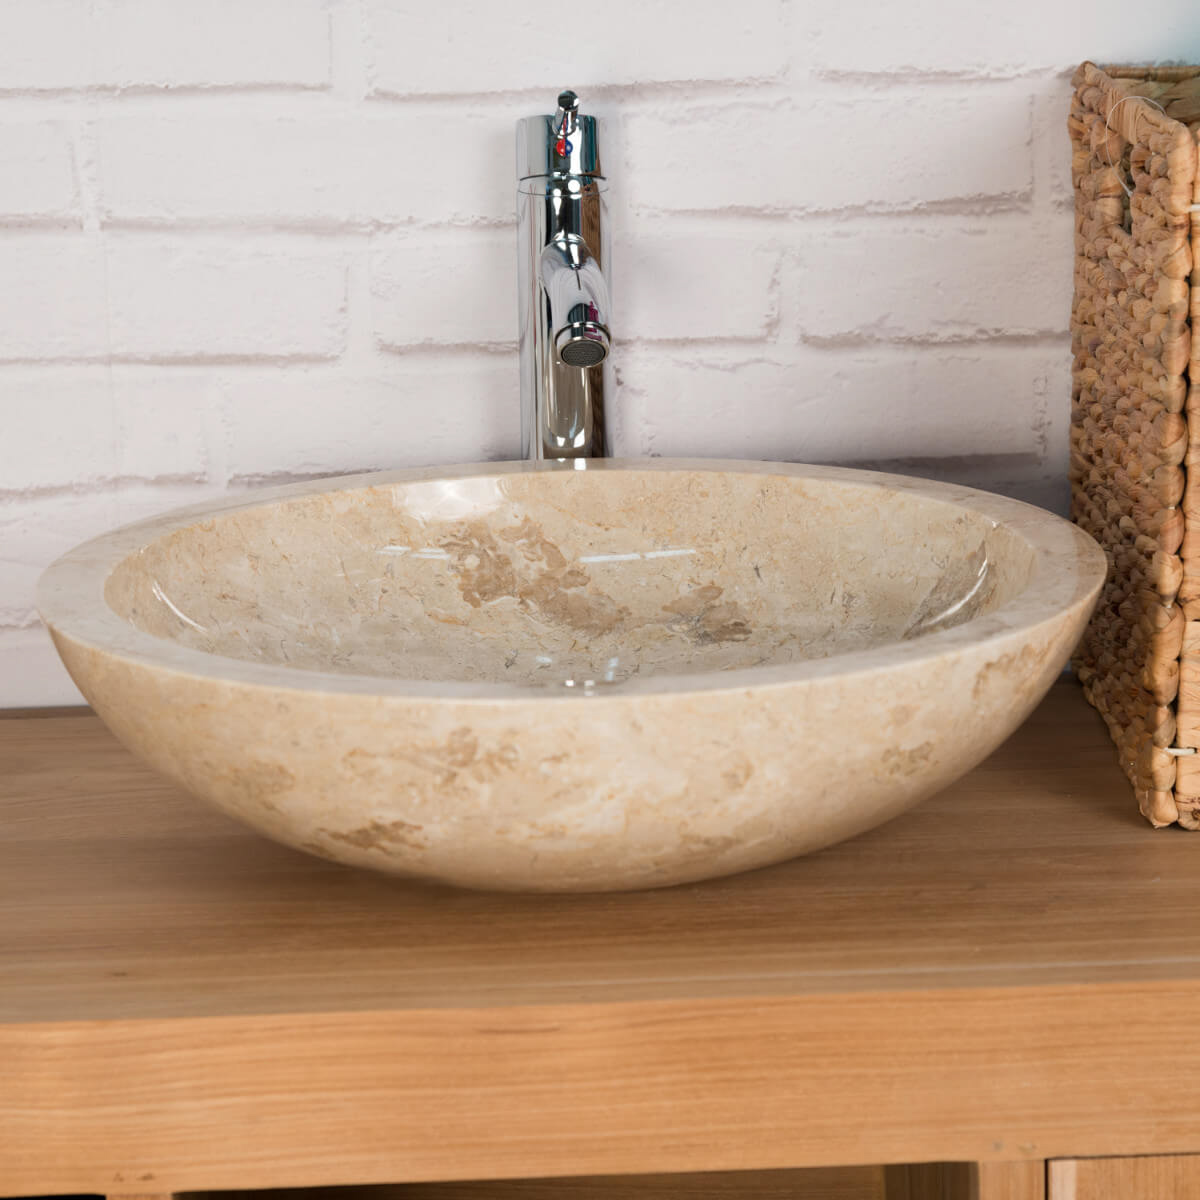 Lavabo marmol cubierta para lavabo de mrmol travertino for Lavabo marmol